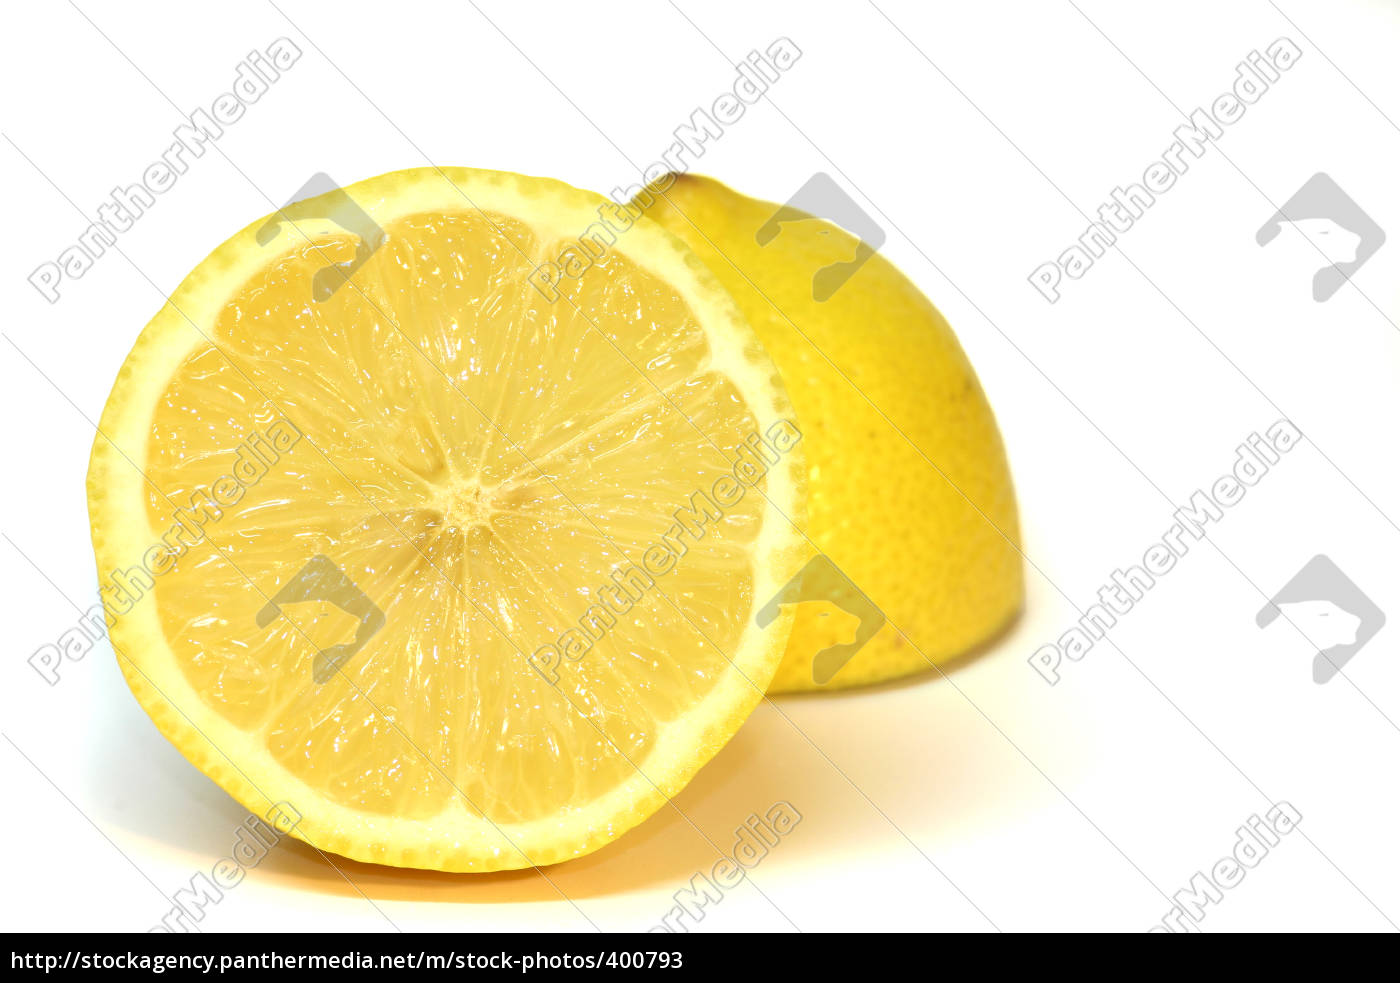 vitamins - 400793